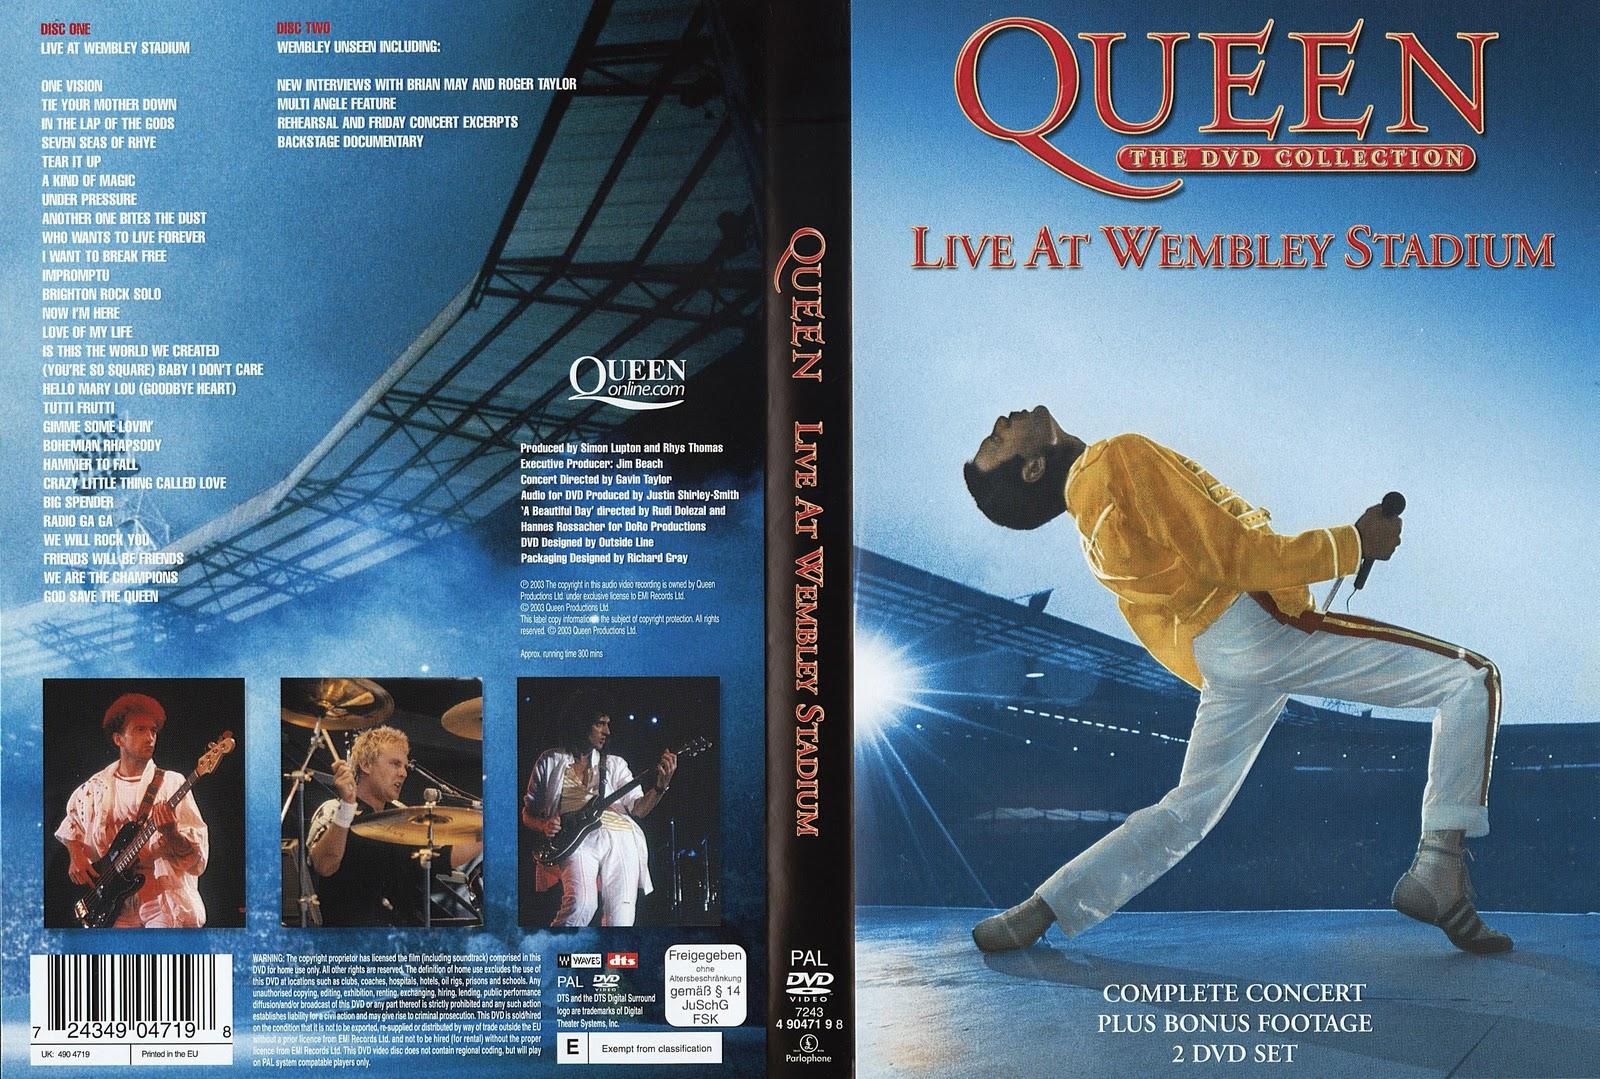 Queen - Live At Wembley Stadium - 2 DVD cover artwork